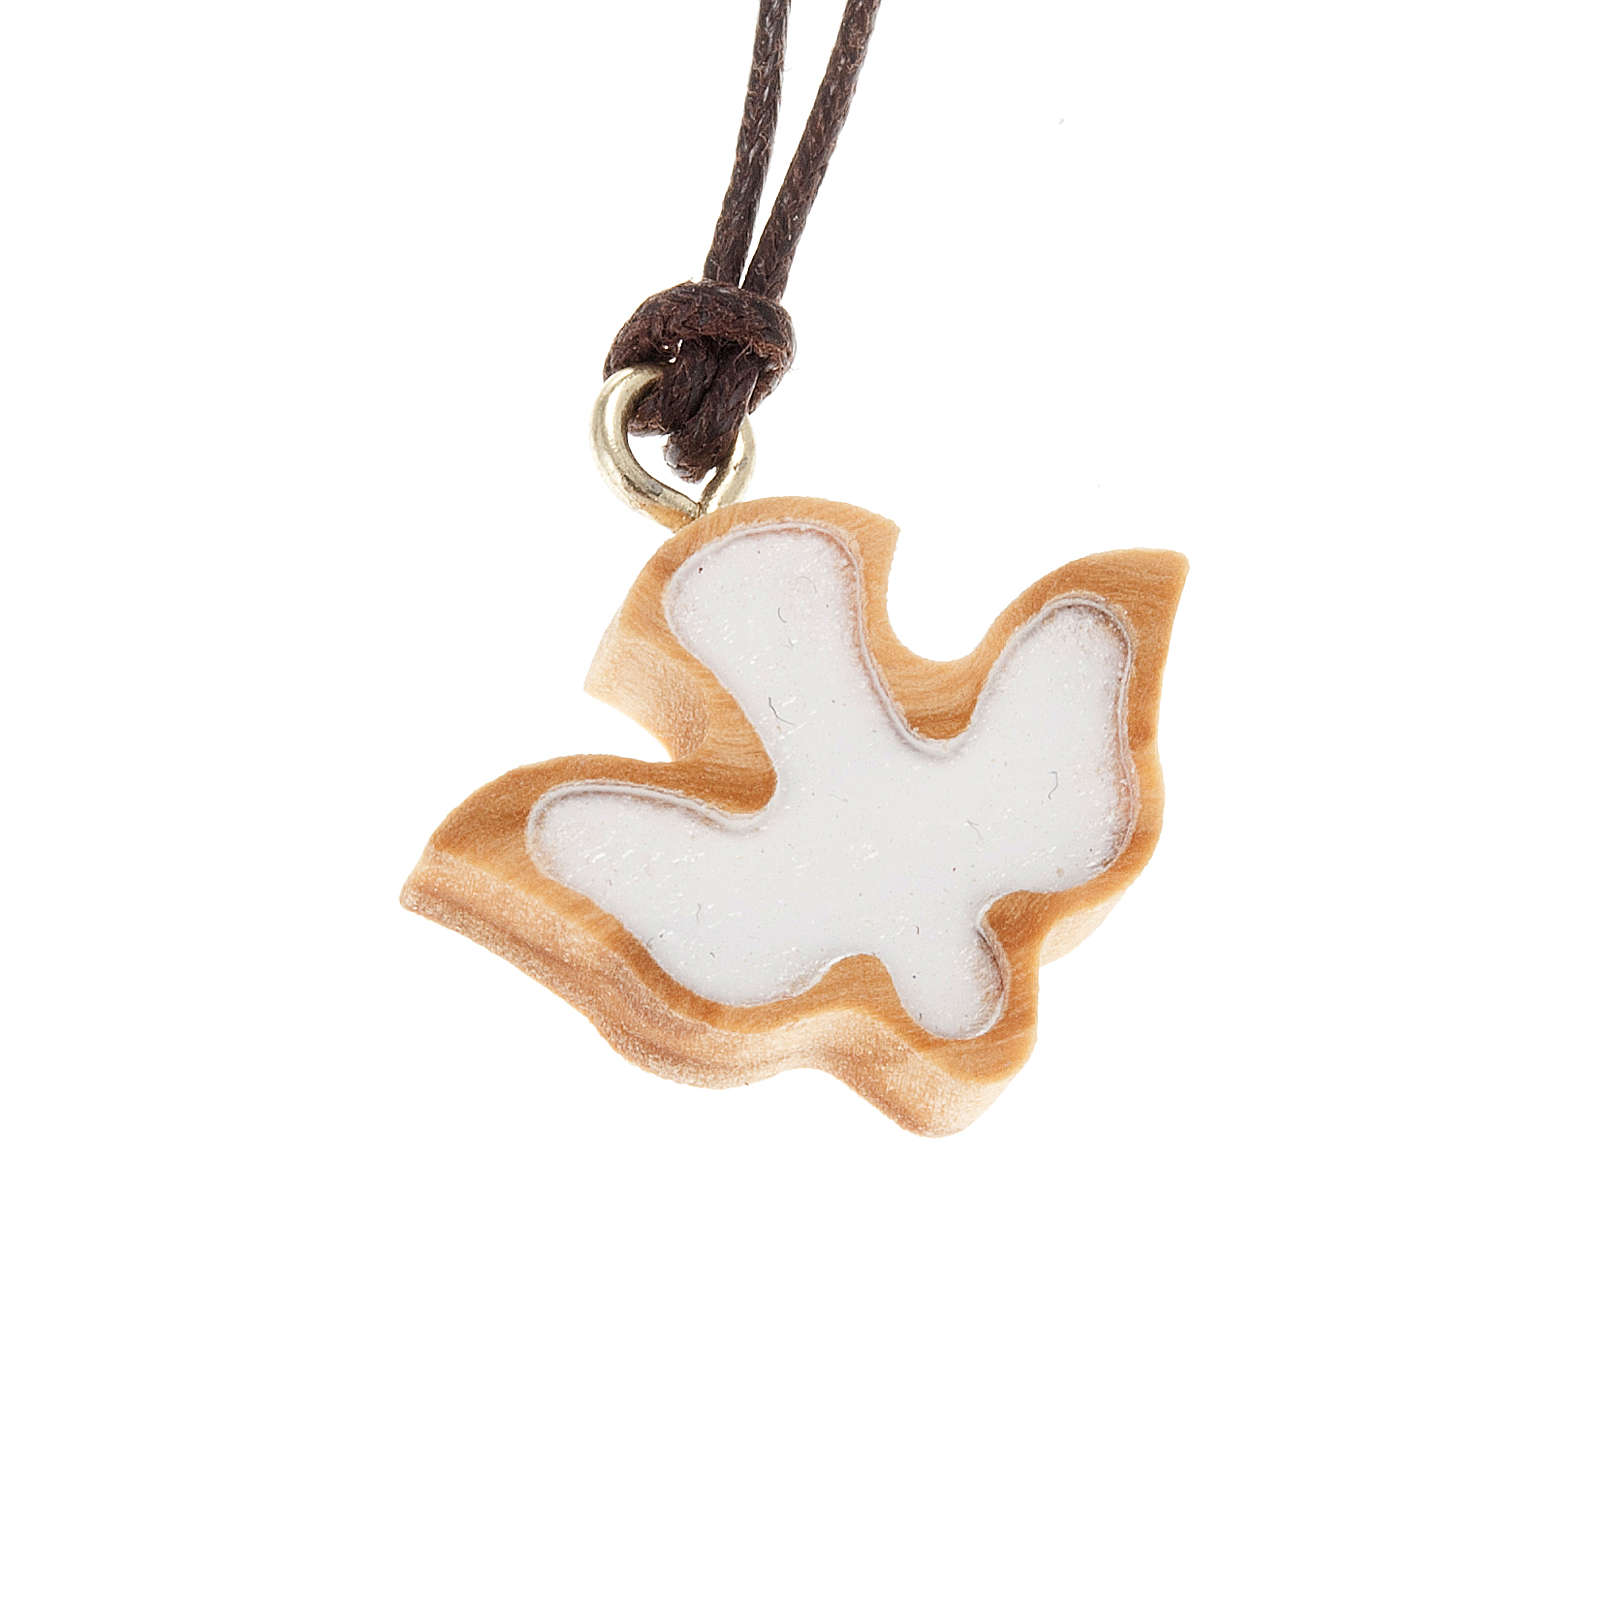 Medalla de madera olivo paloma blanca 4